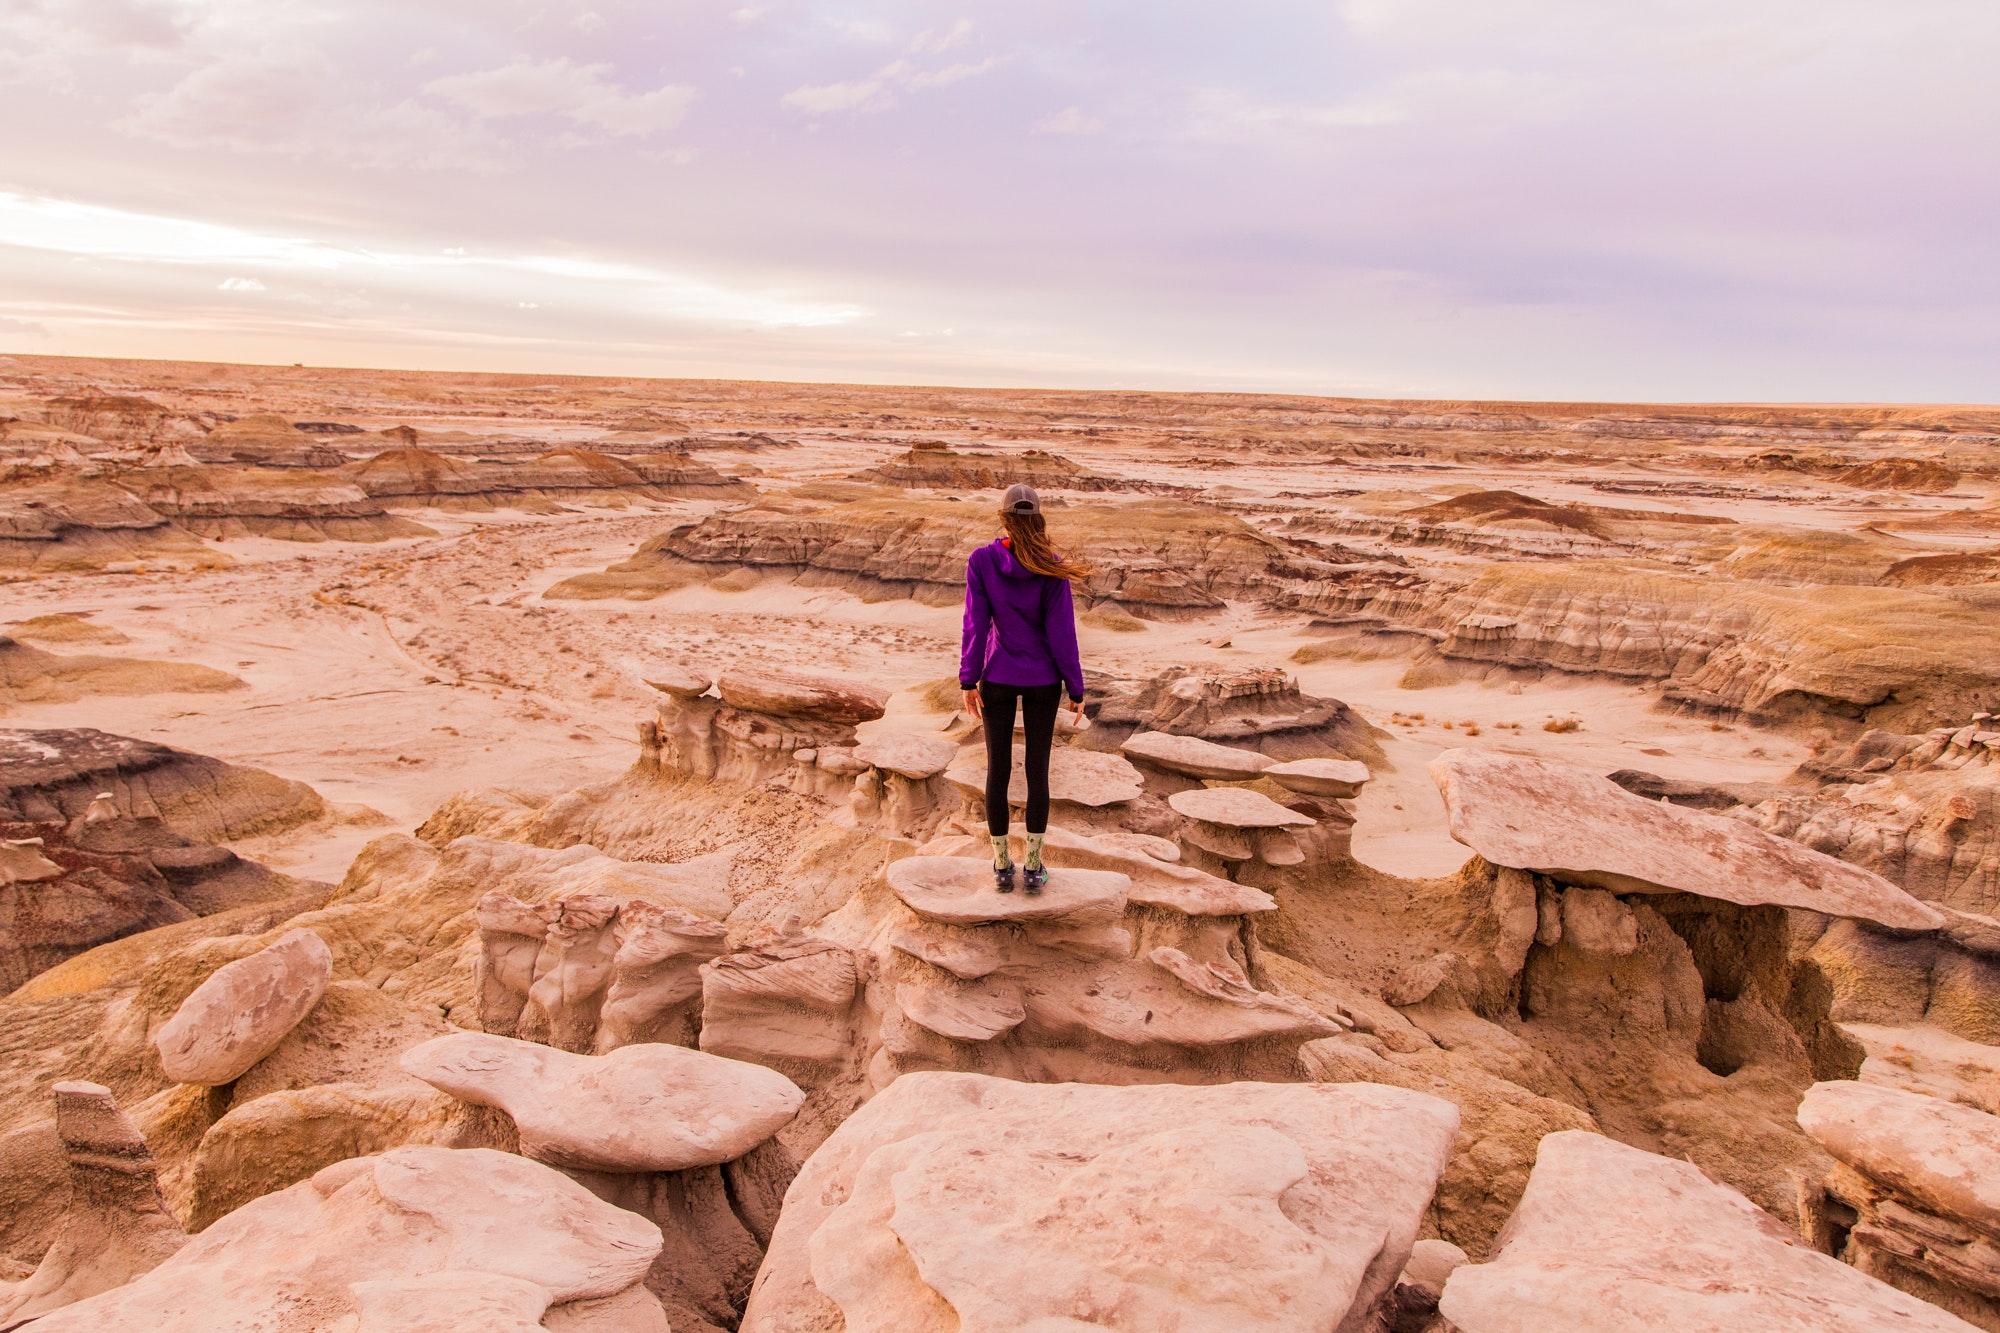 arid-canyon-cliff-965159